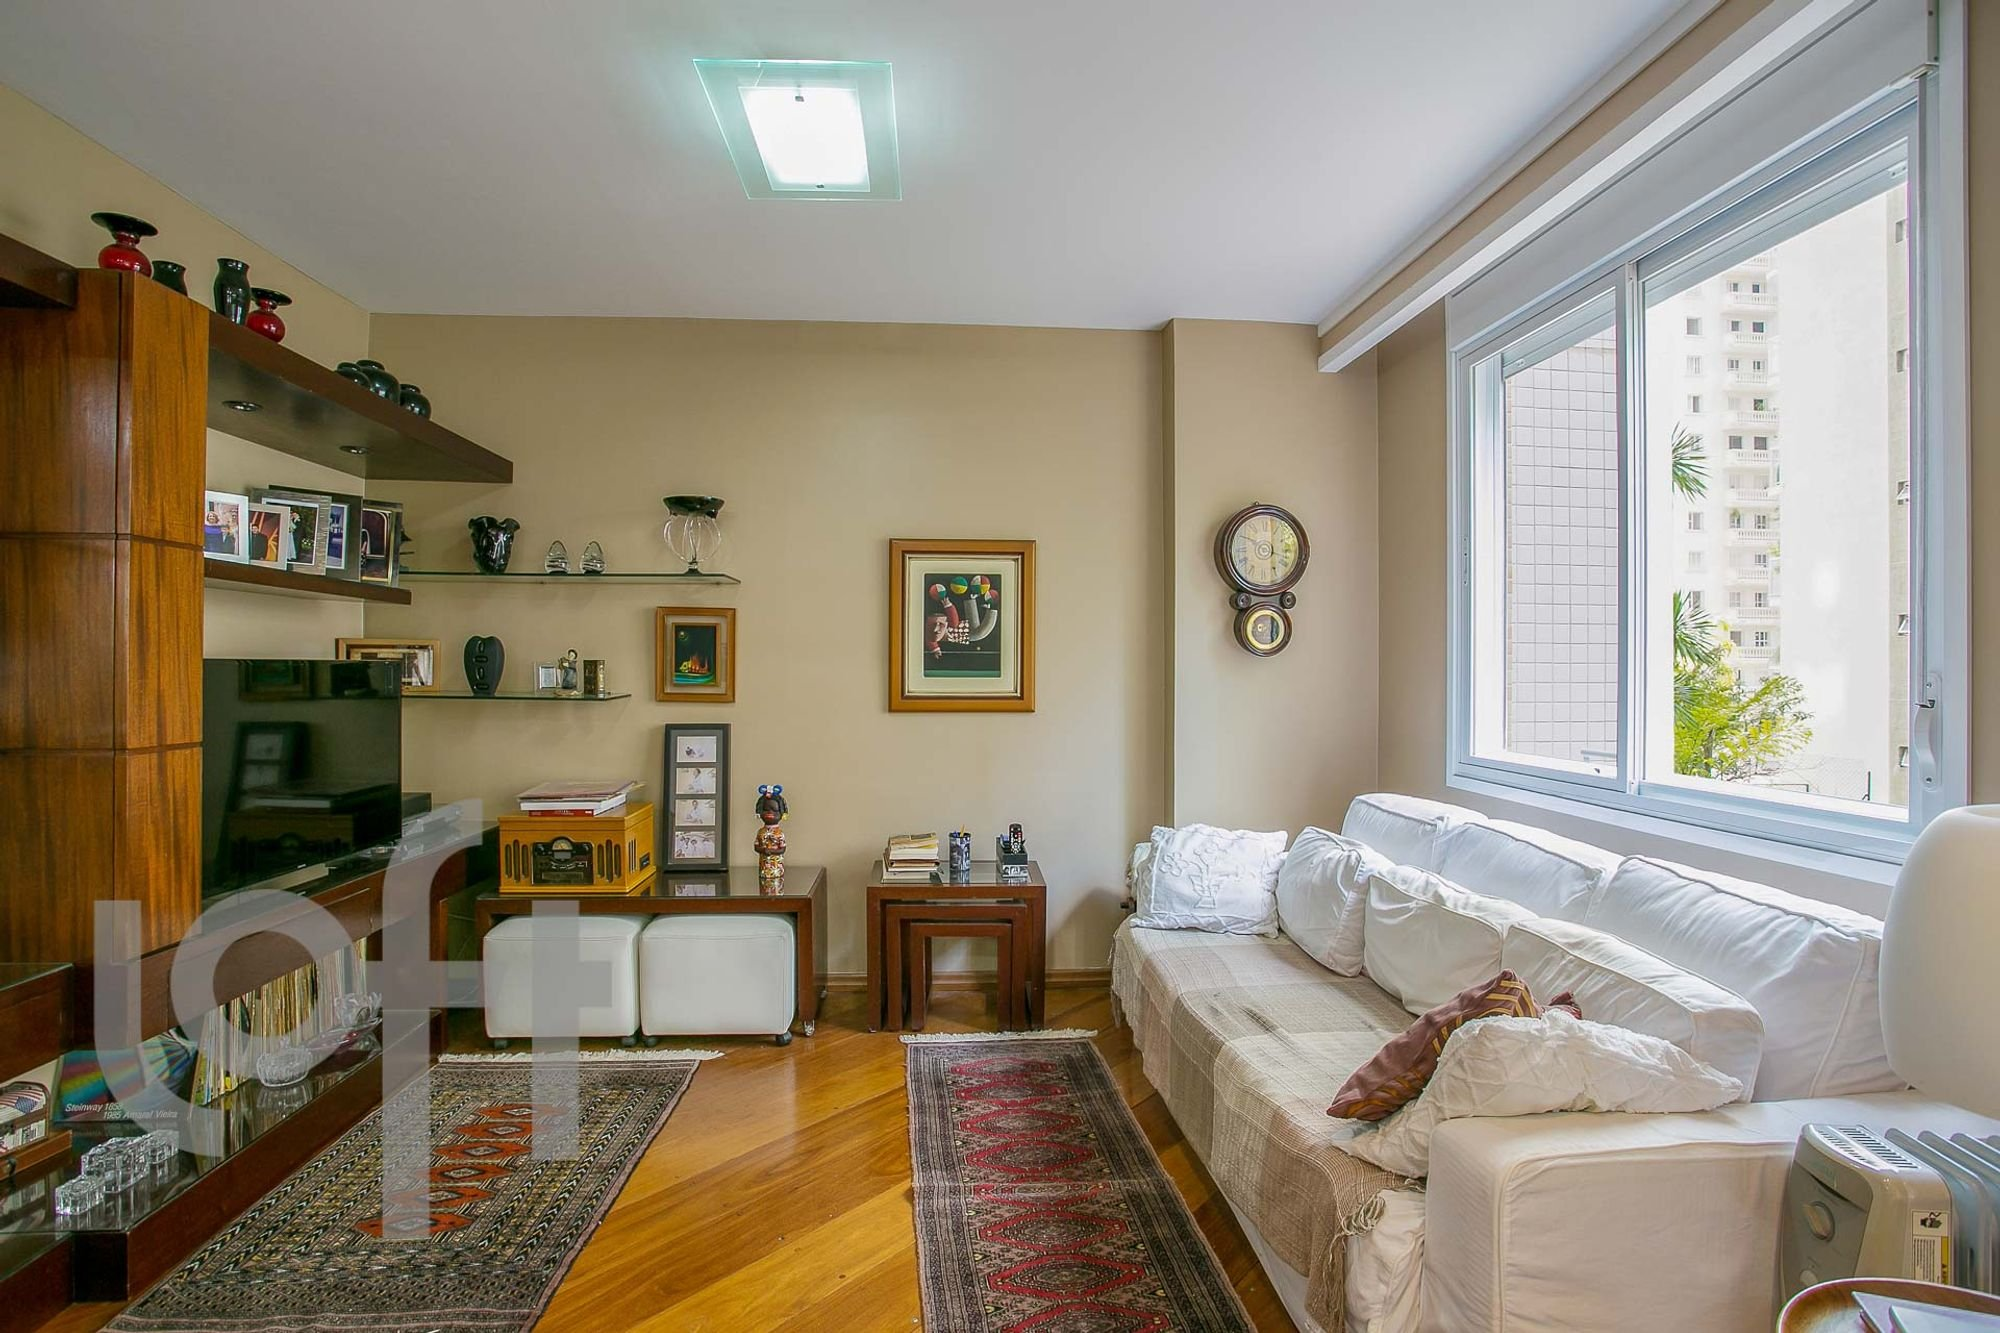 Foto de Sala com sofá, vaso, relógio